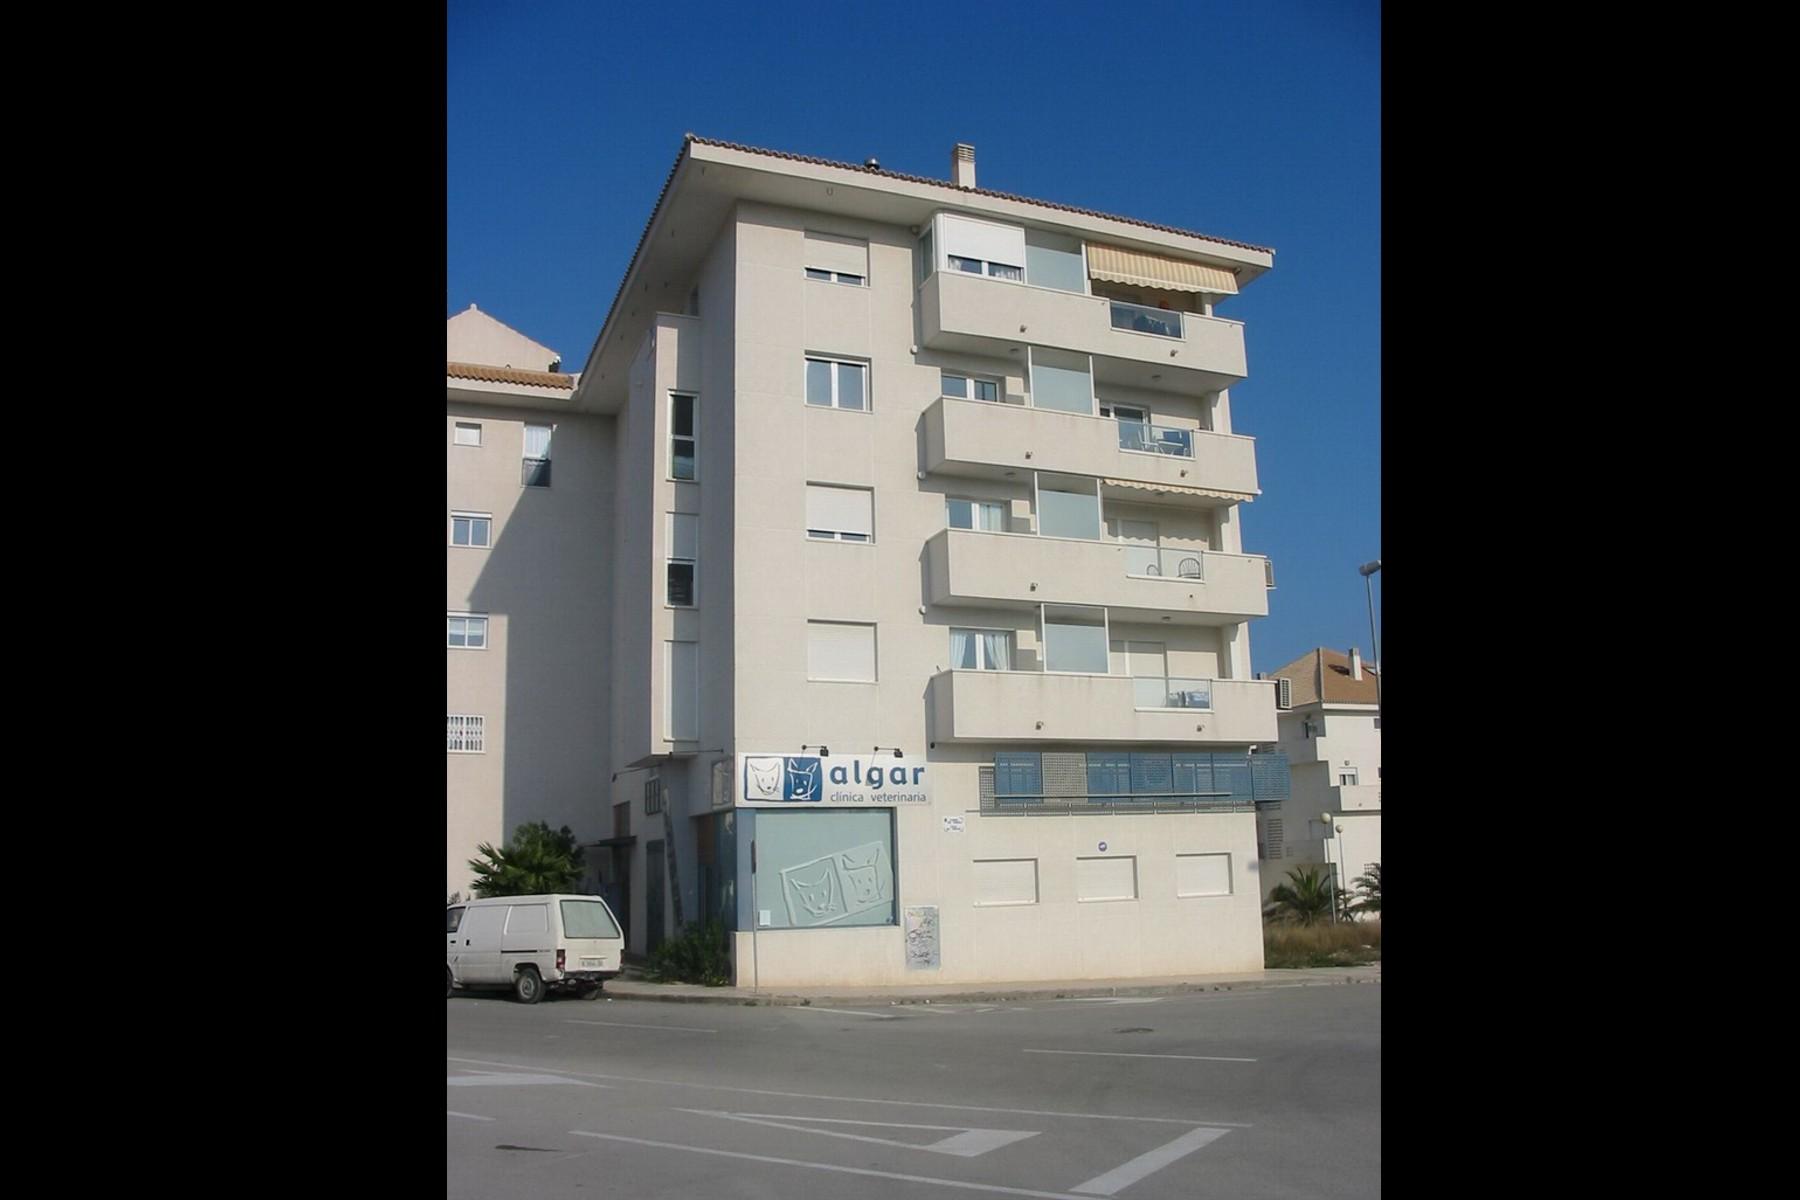 Imaginarq-053-Edificio-Viviendas-Altea-Alicante-24A